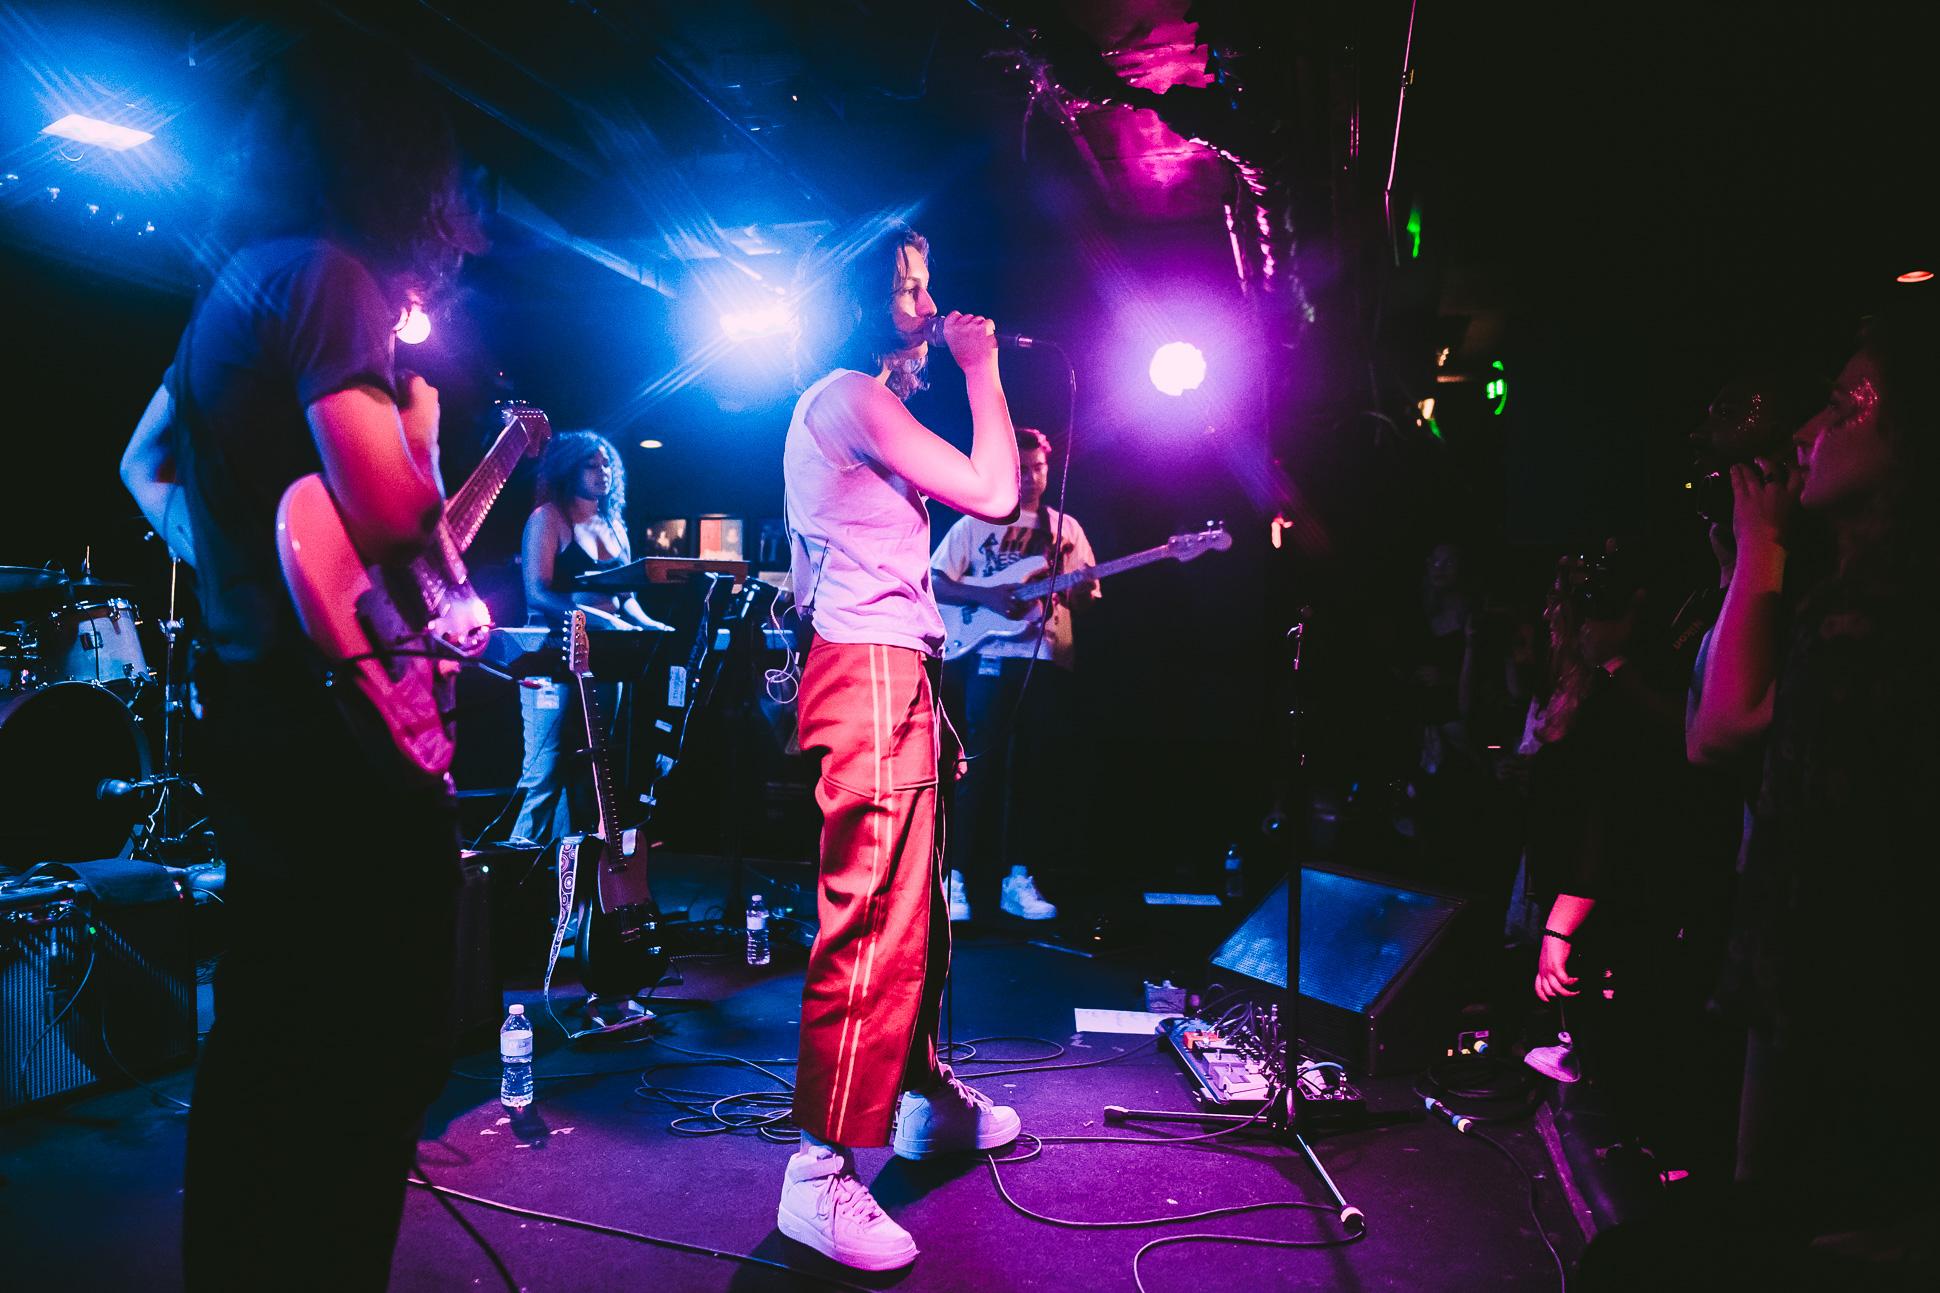 KingPrincess-BiltmoreCabaret-20-07-2018-Vancouver-5.jpg